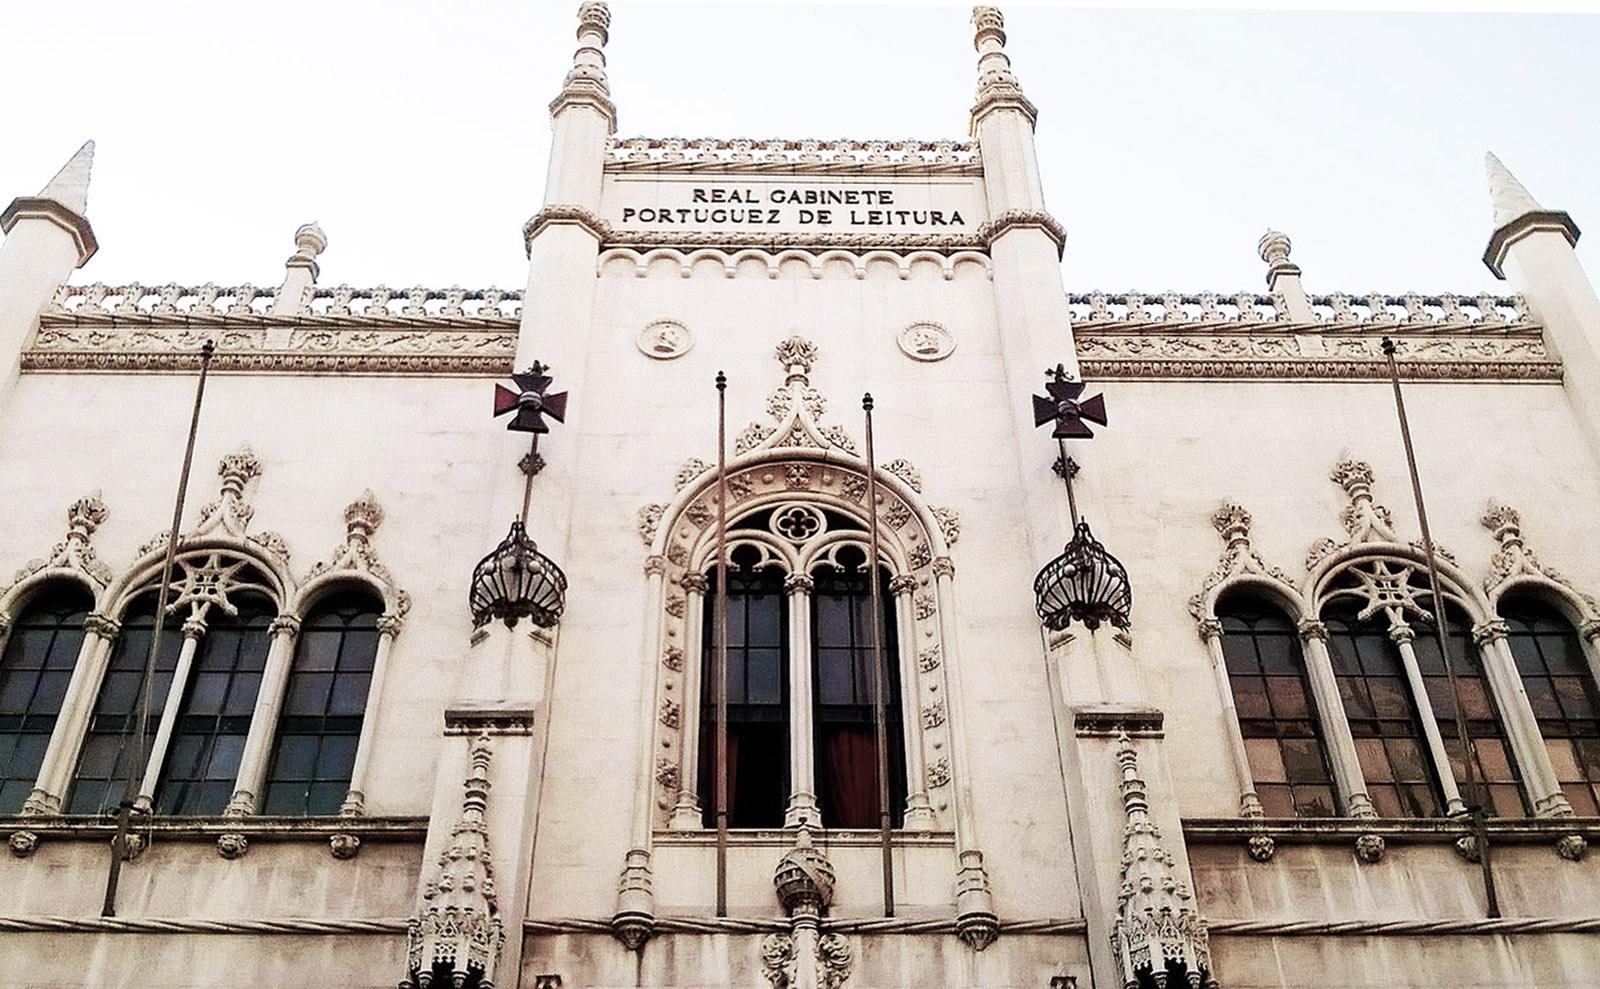 facade of the royal portuguese reading room